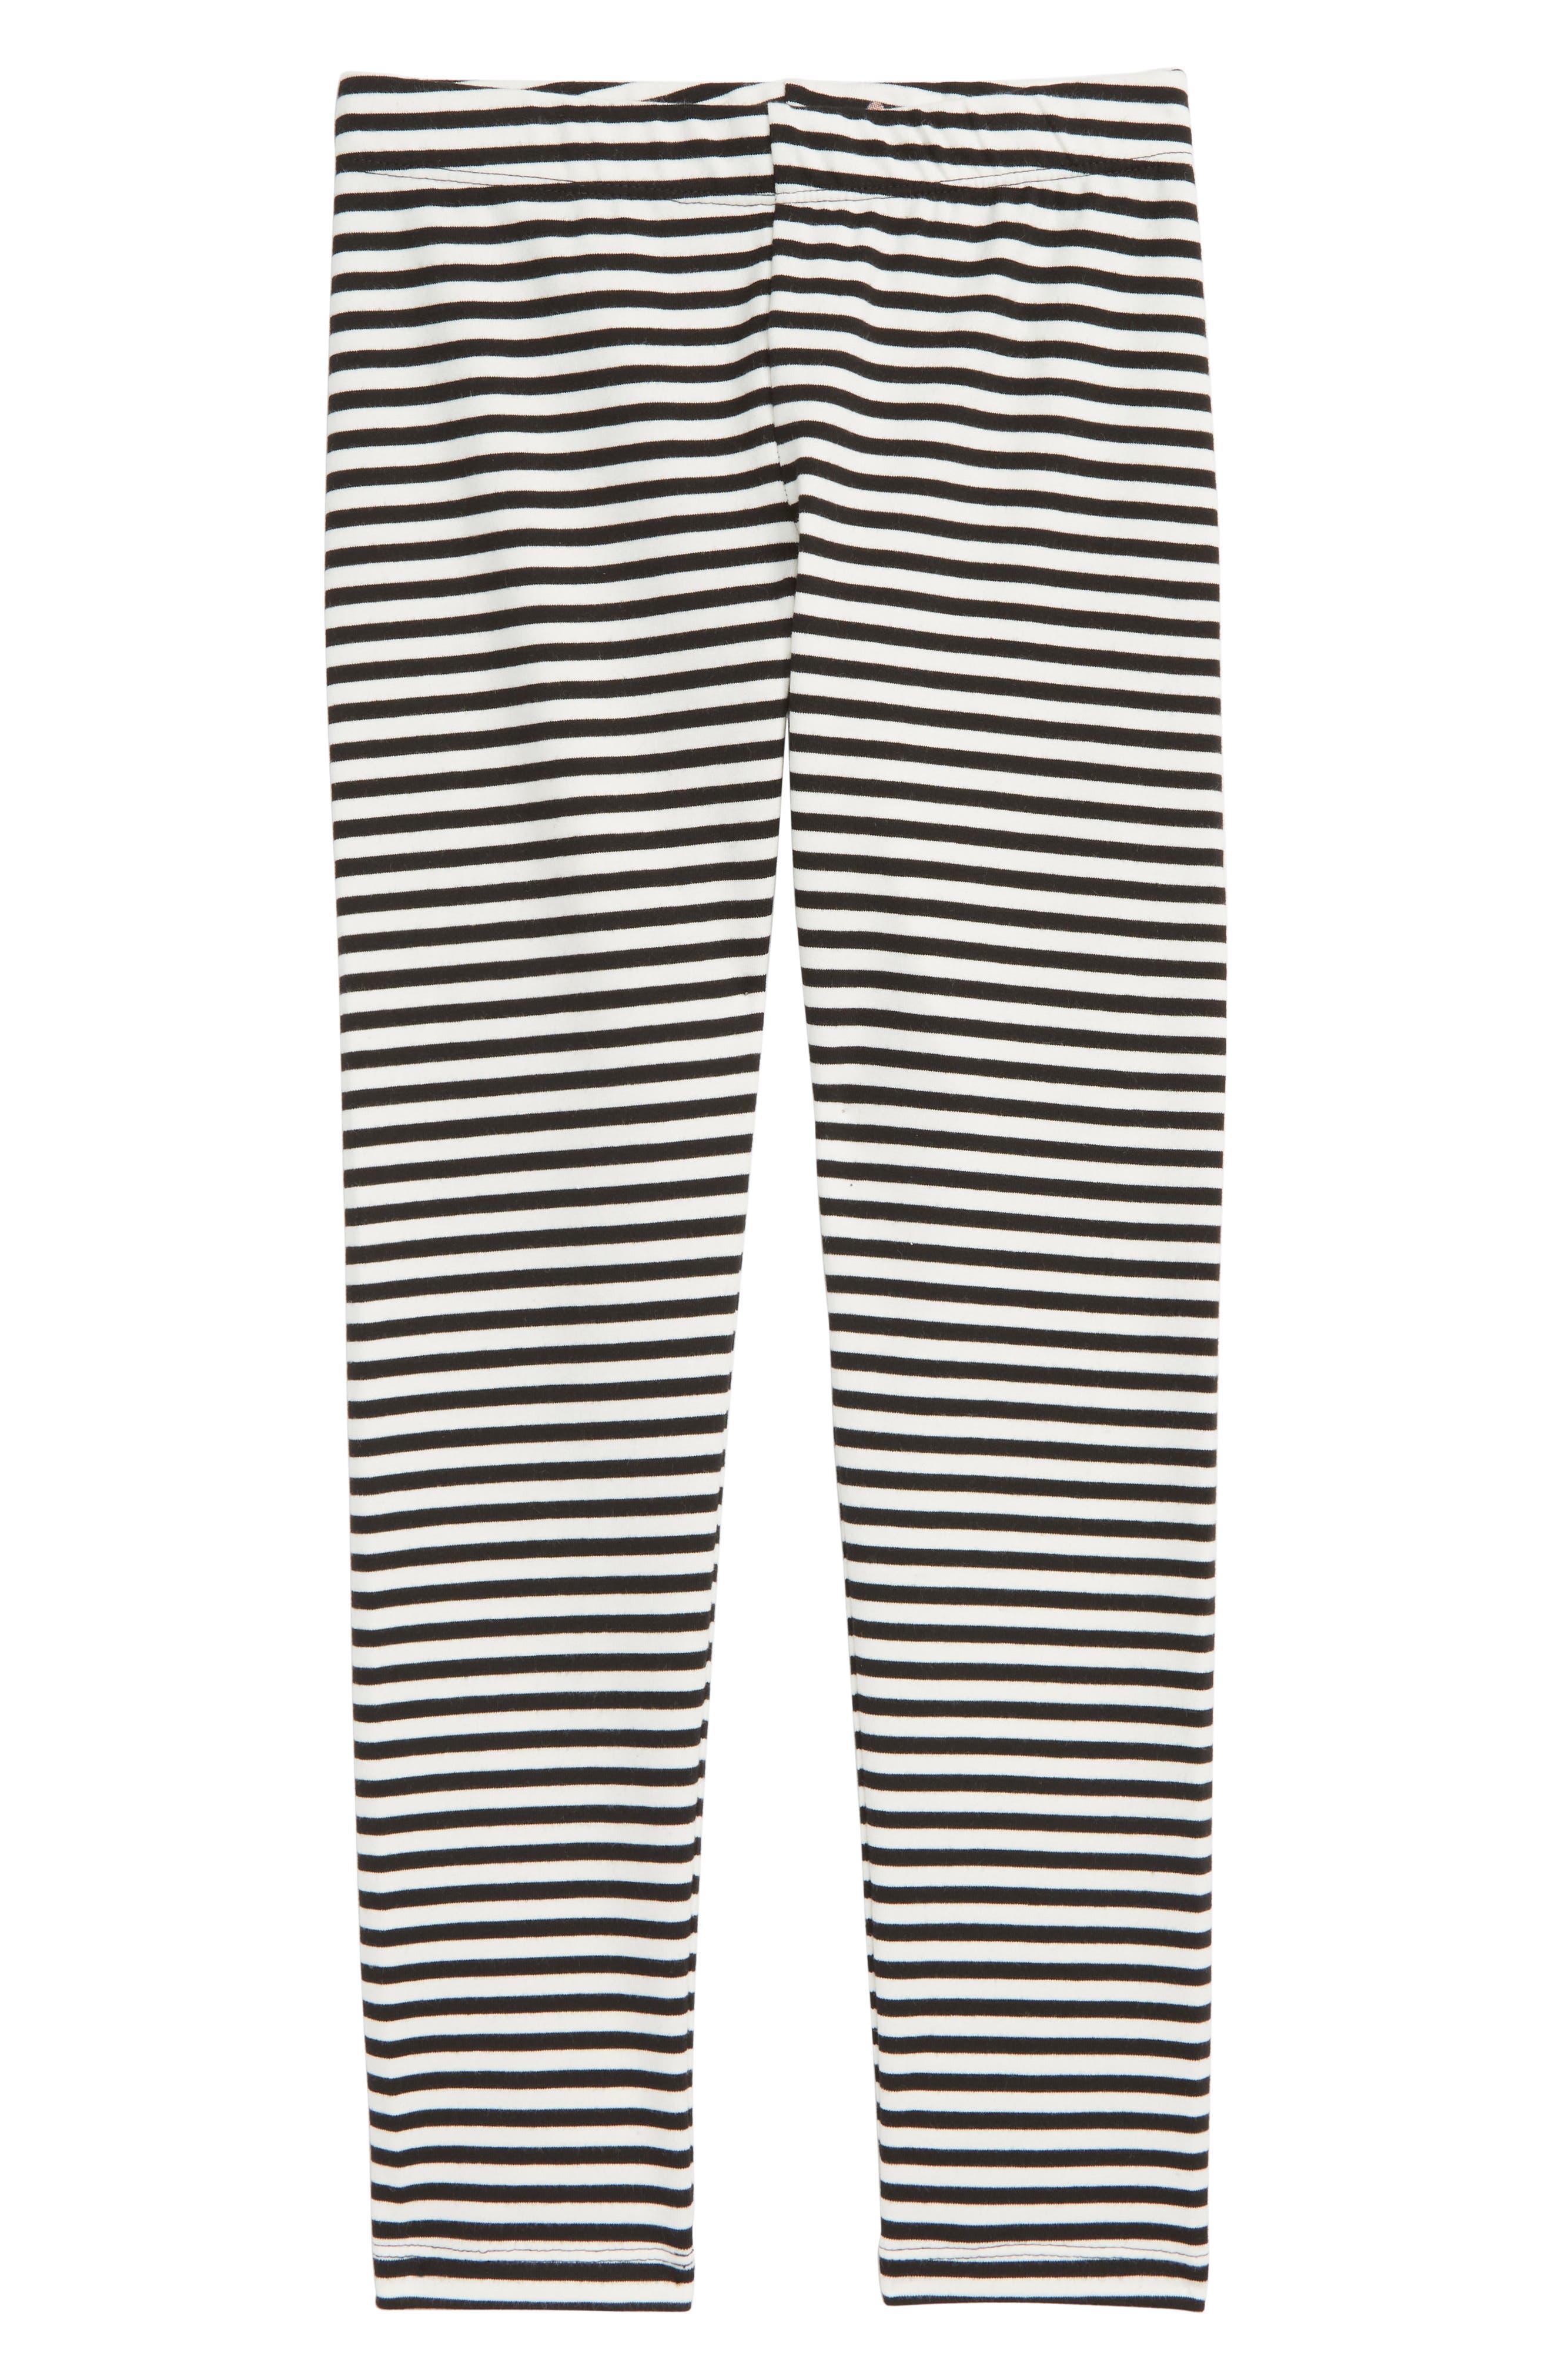 Stripe Leggings,                         Main,                         color, BLACK AND WHITE STRIPE